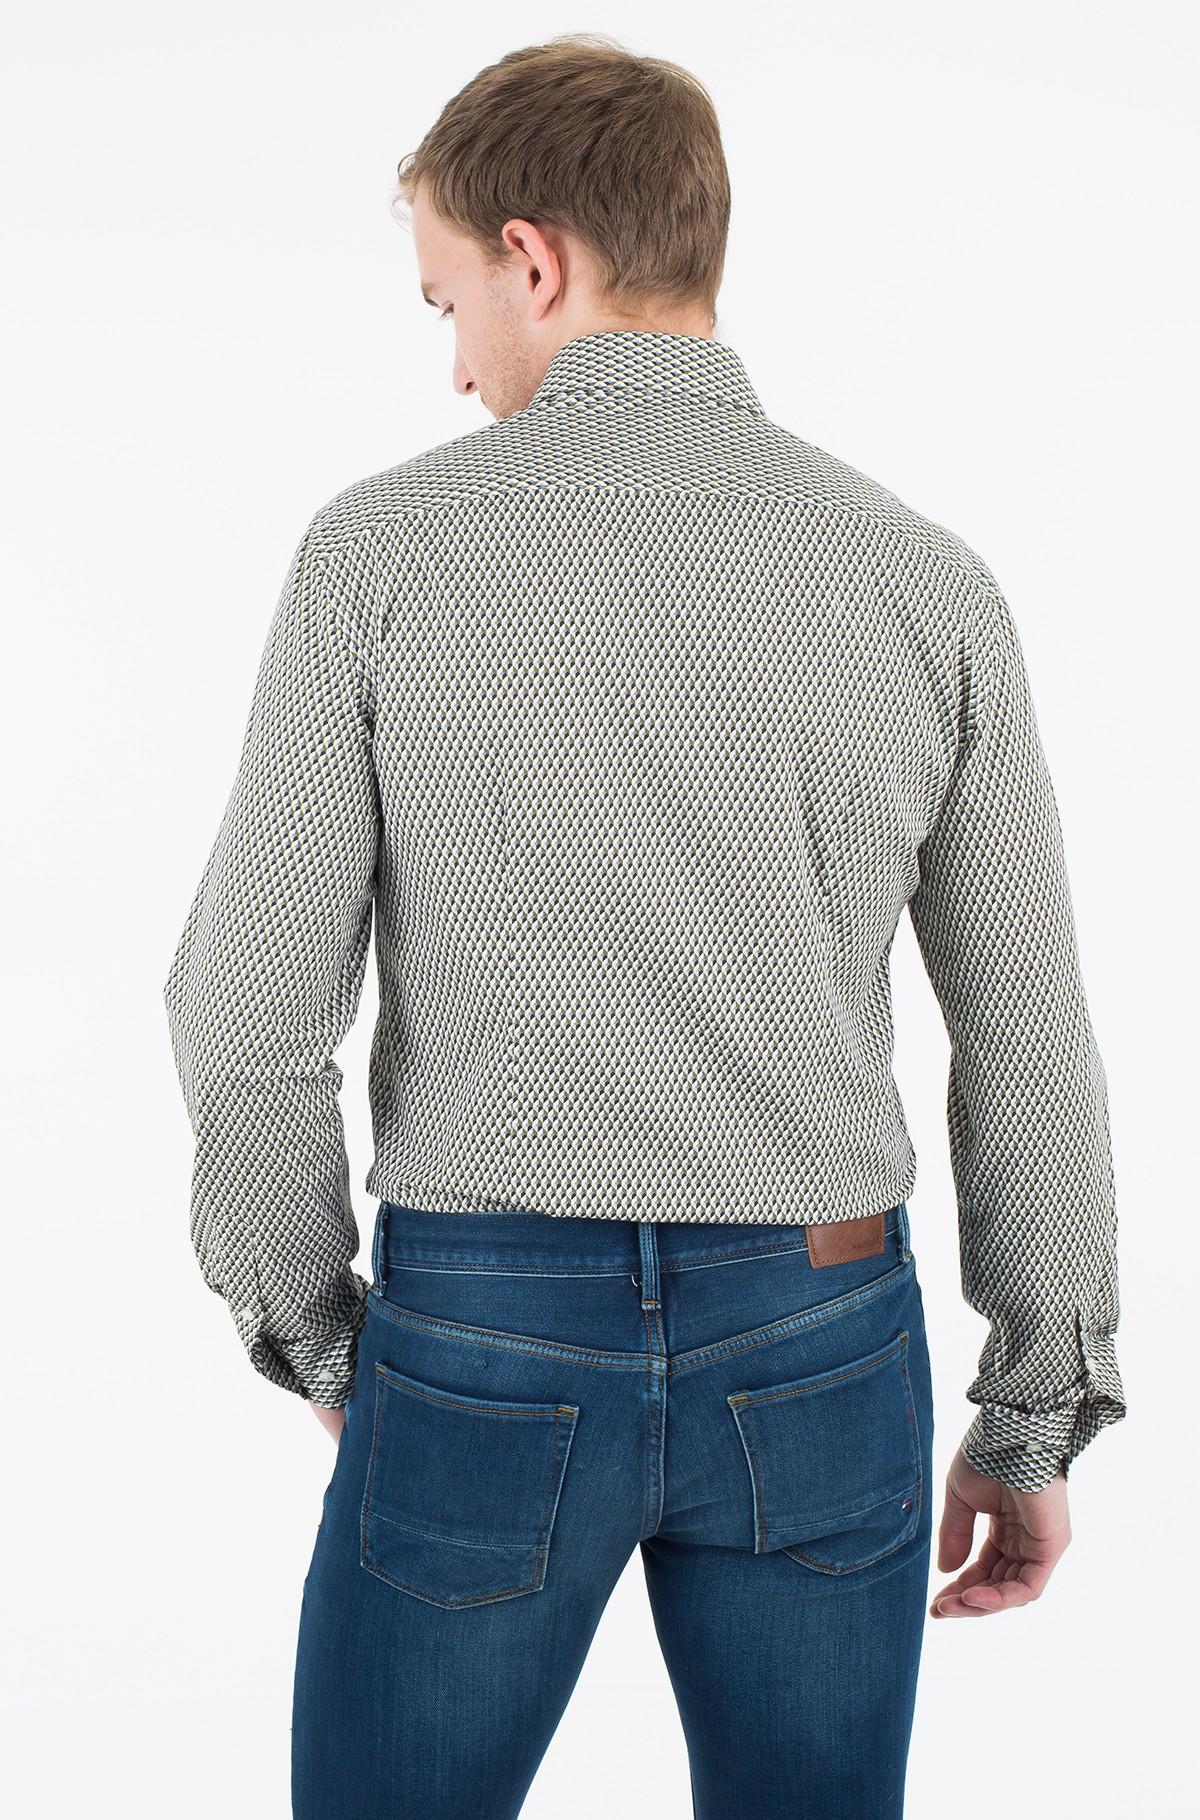 Marškiniai PRK SHTPRT17308-full-2